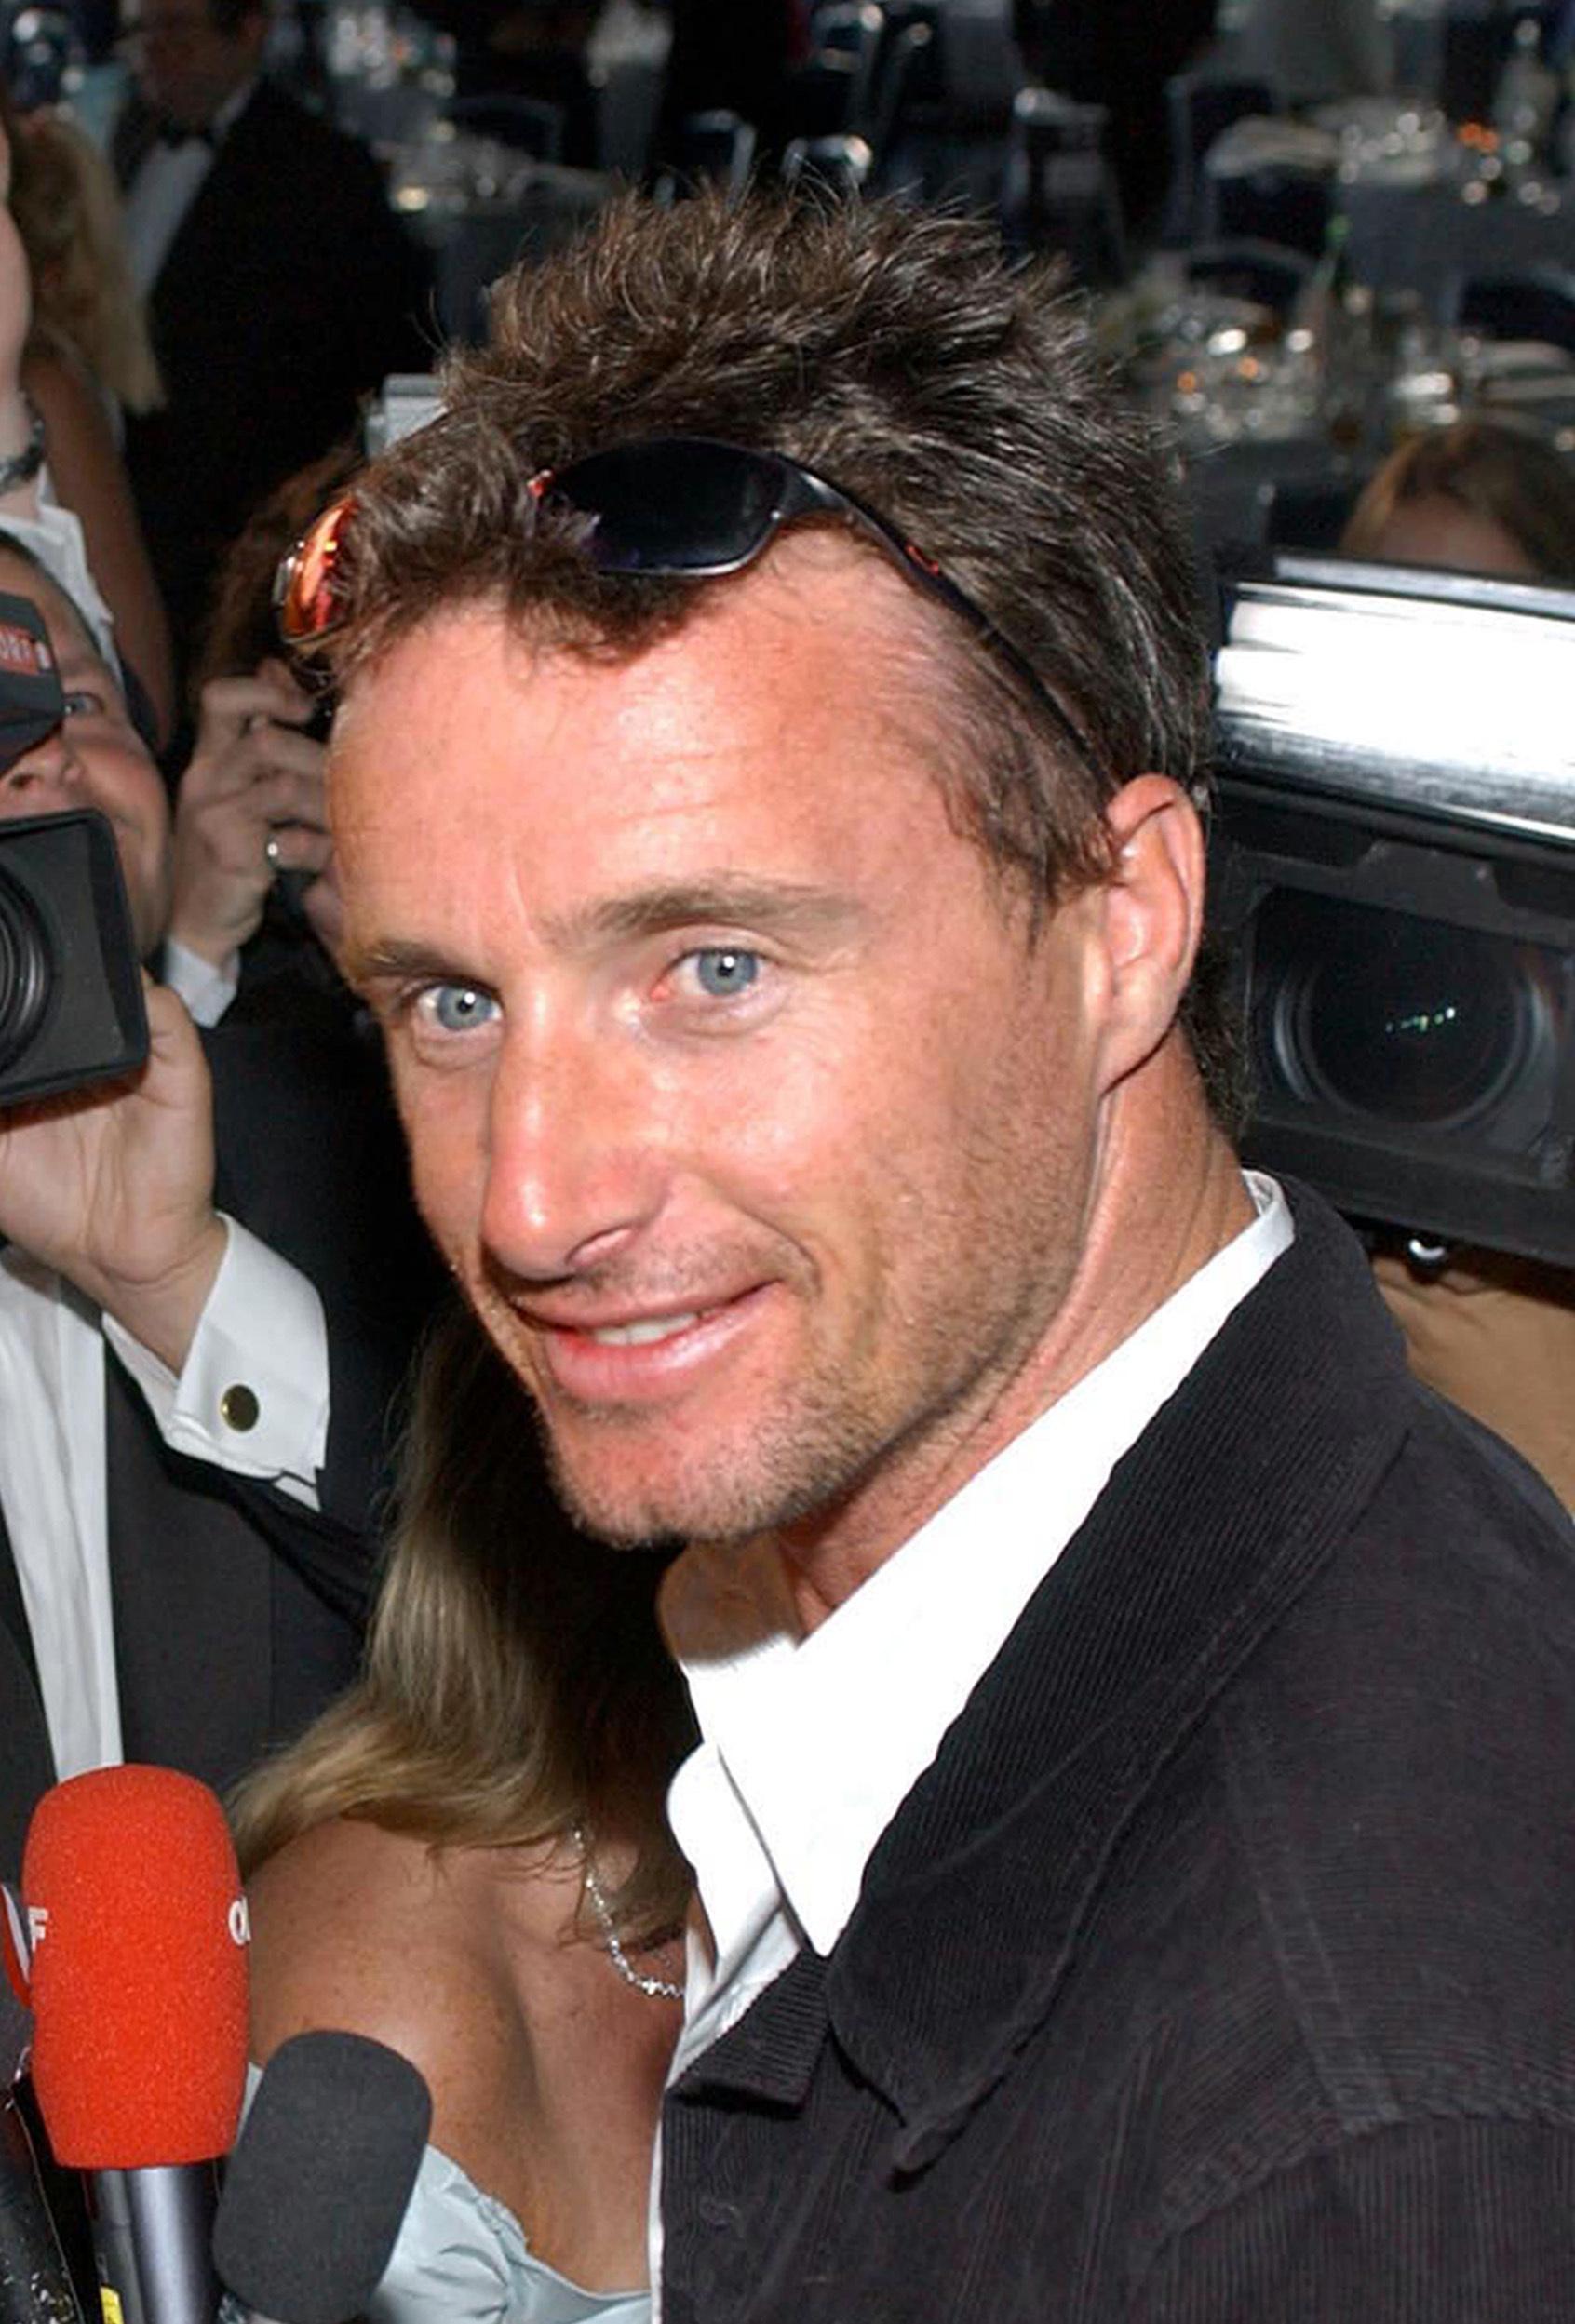 Northern Irishman Irvine raced in Formula 1 for nine seasons during the era of Damon Hill and Michael Schumacher